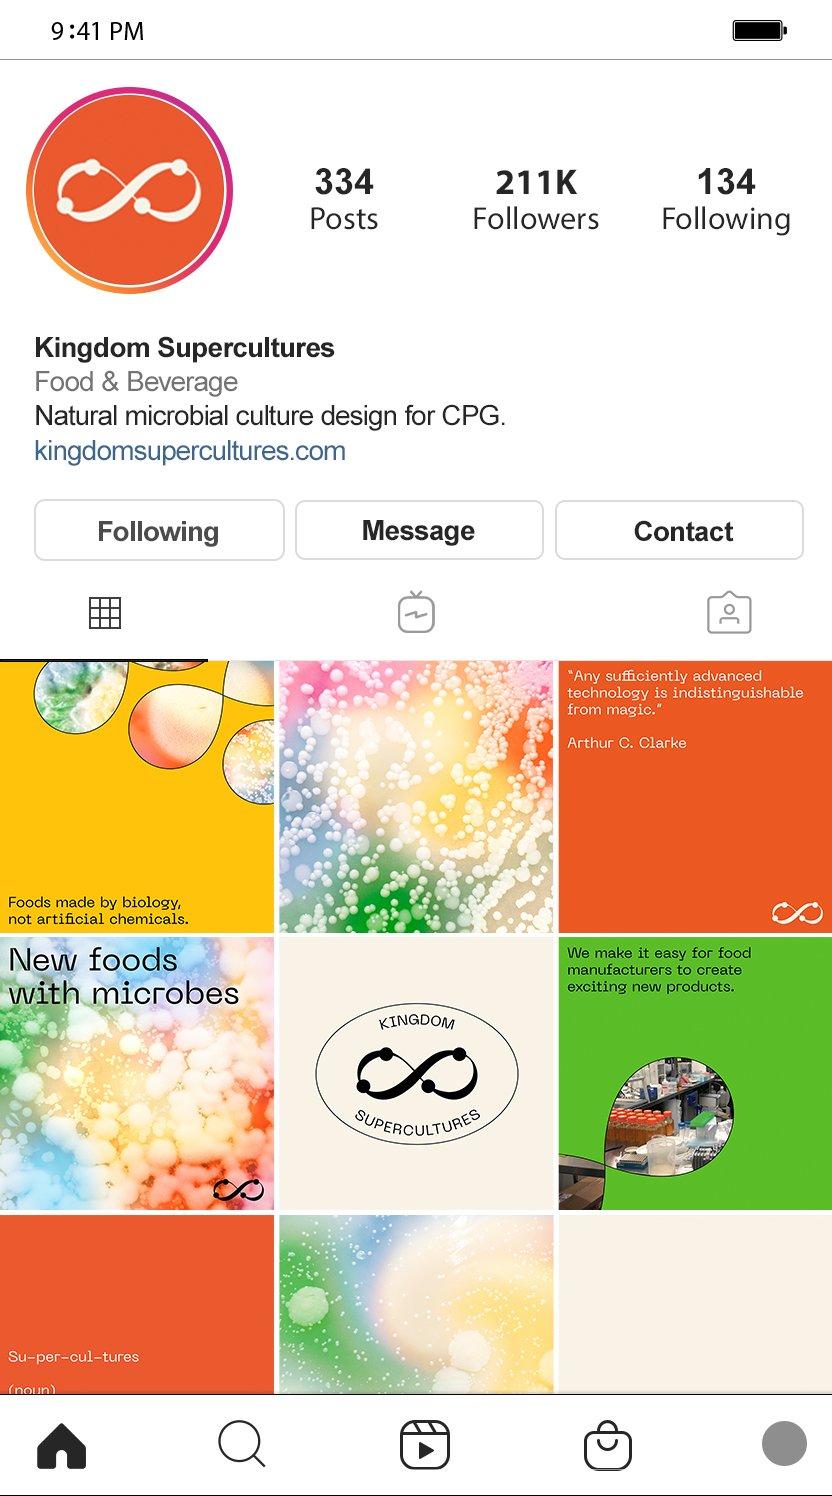 Kingdom Supercultures Social Media Instagram Grid, designed by RoAndCo